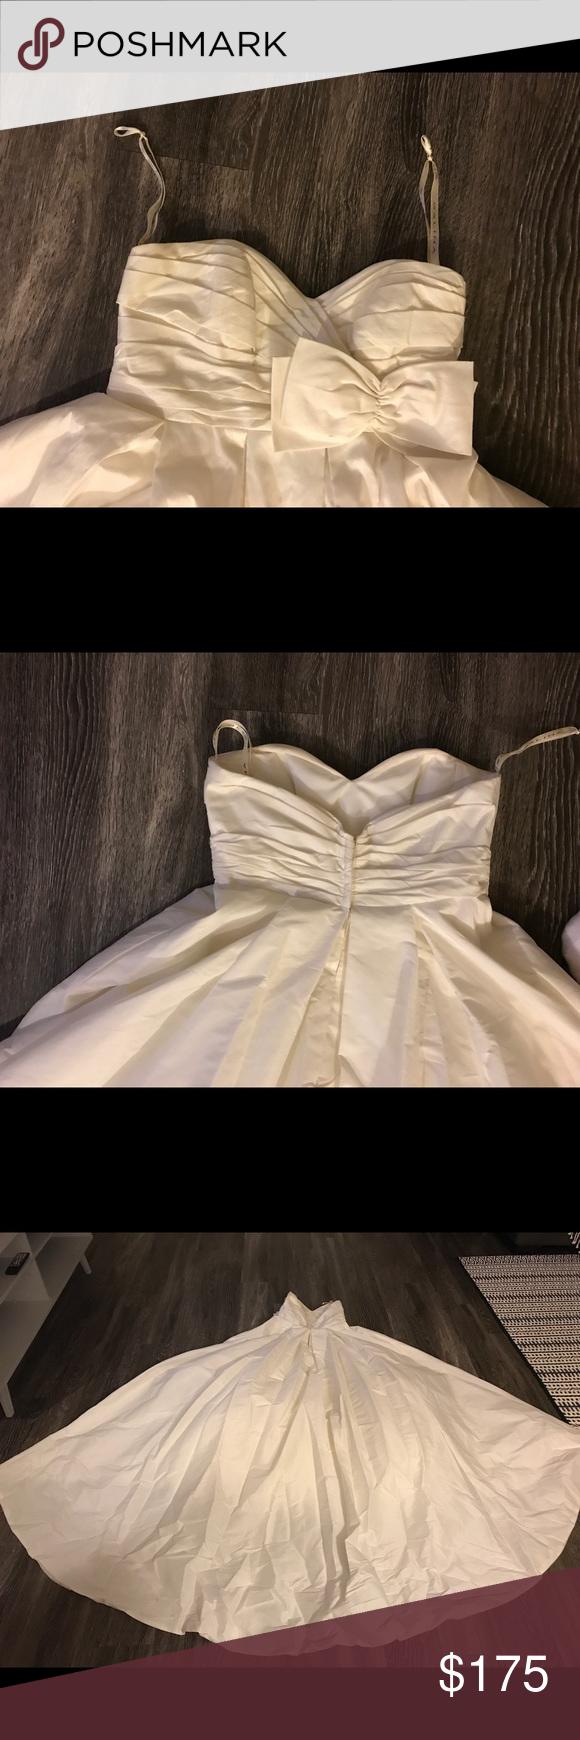 Wedding dress dry cleaning near me  Galina wedding dress size   Wedding dress sizes Size  and Brooches